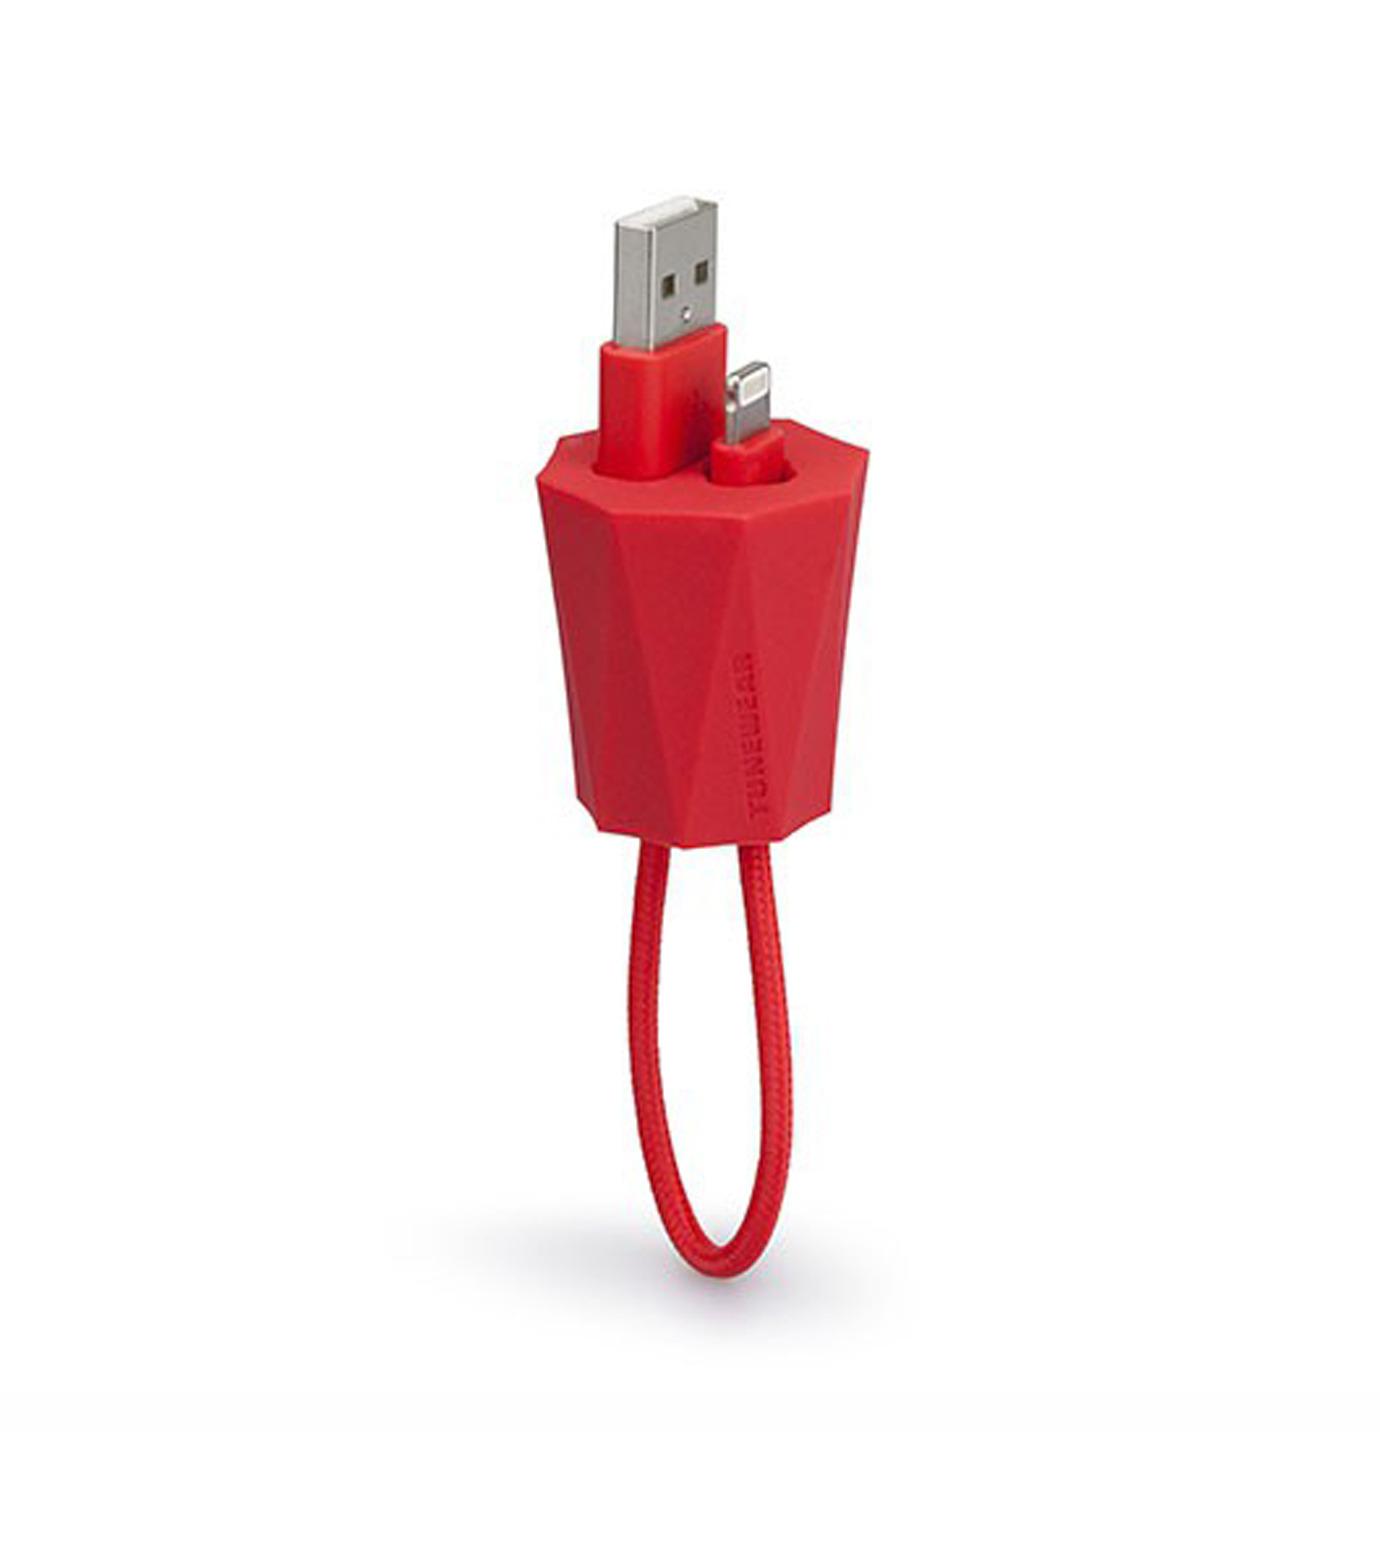 Tunewear(チューンウエア)のCableArt Lantern-RED(ガジェット/gadgets)-TUN-OT-0023-62 拡大詳細画像4